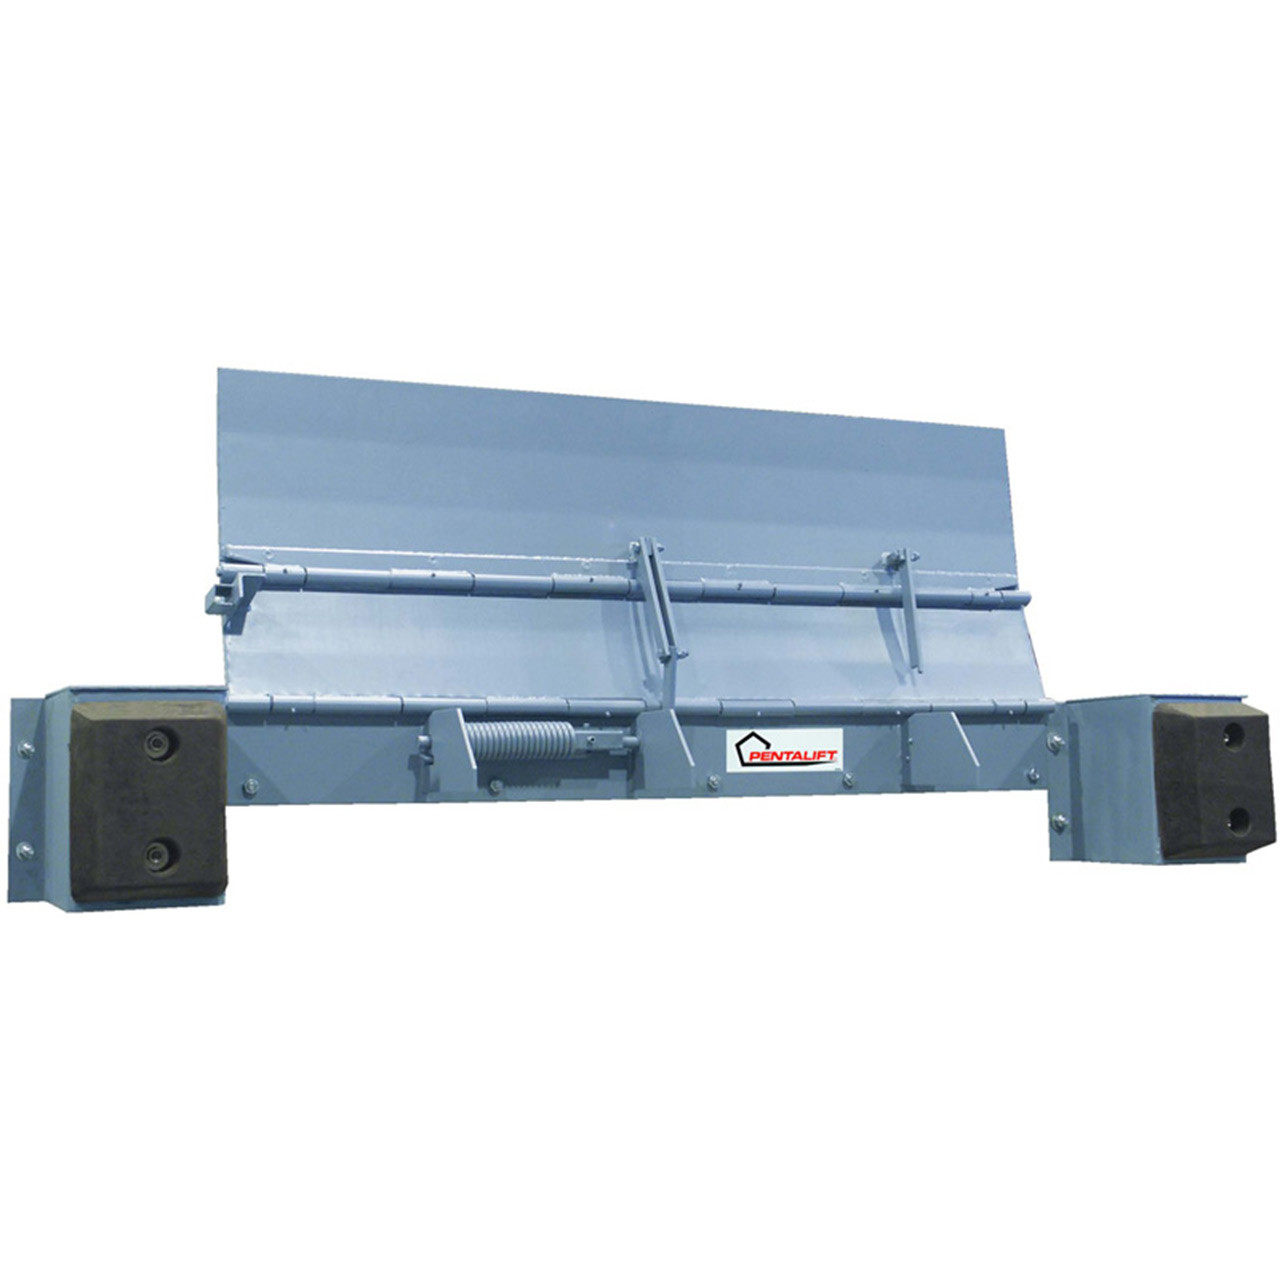 Mechanical Edge-Of-Dock Levelers Up